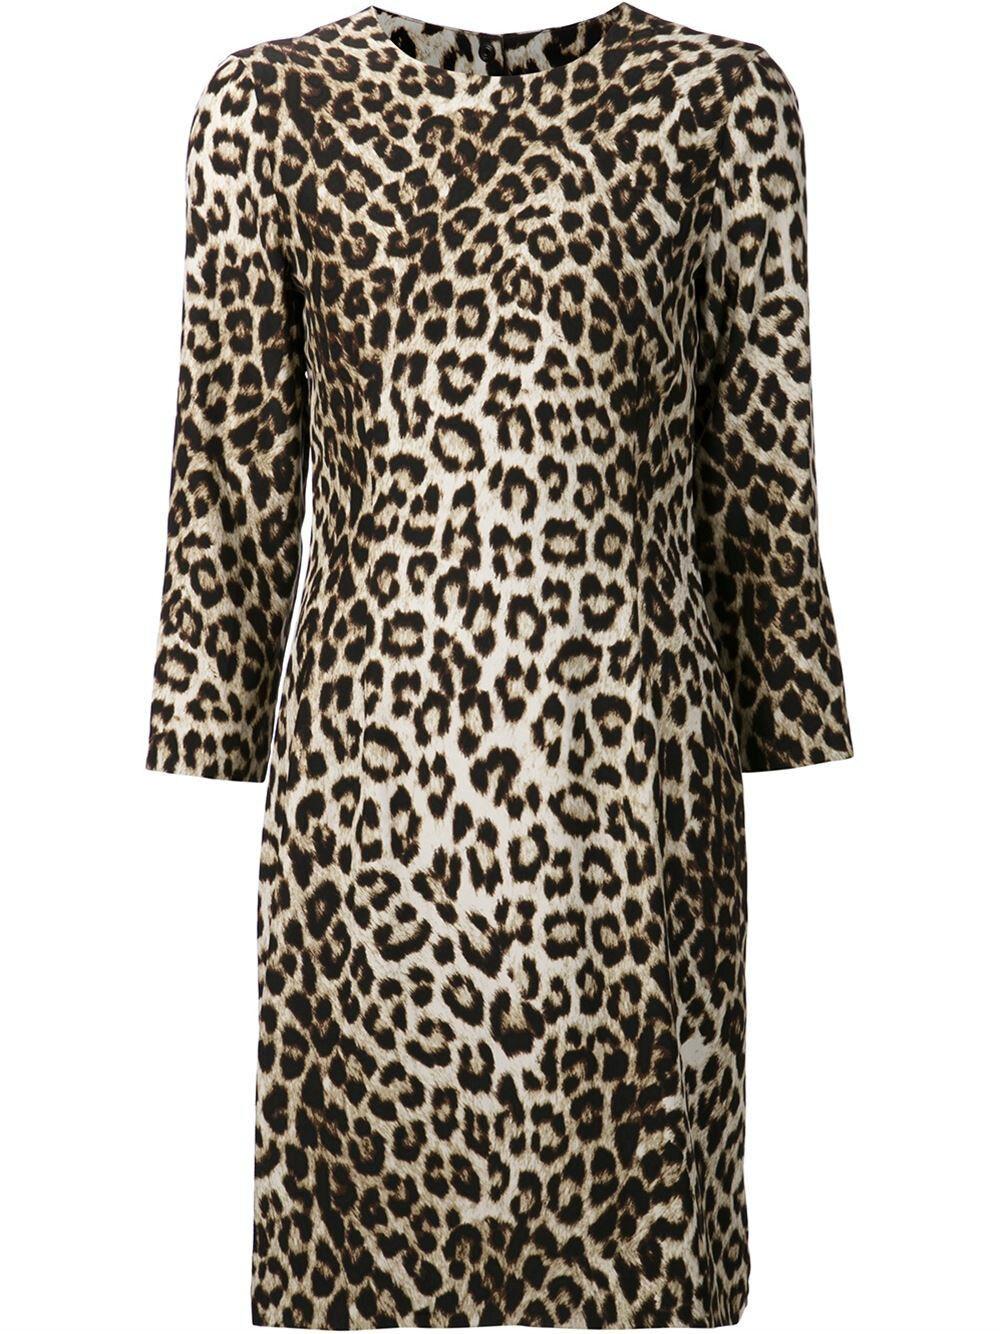 Rag Rag Rag & Bone Short Silk Leopard Print Dress Size 4 (MSRP   595) b9e3a3